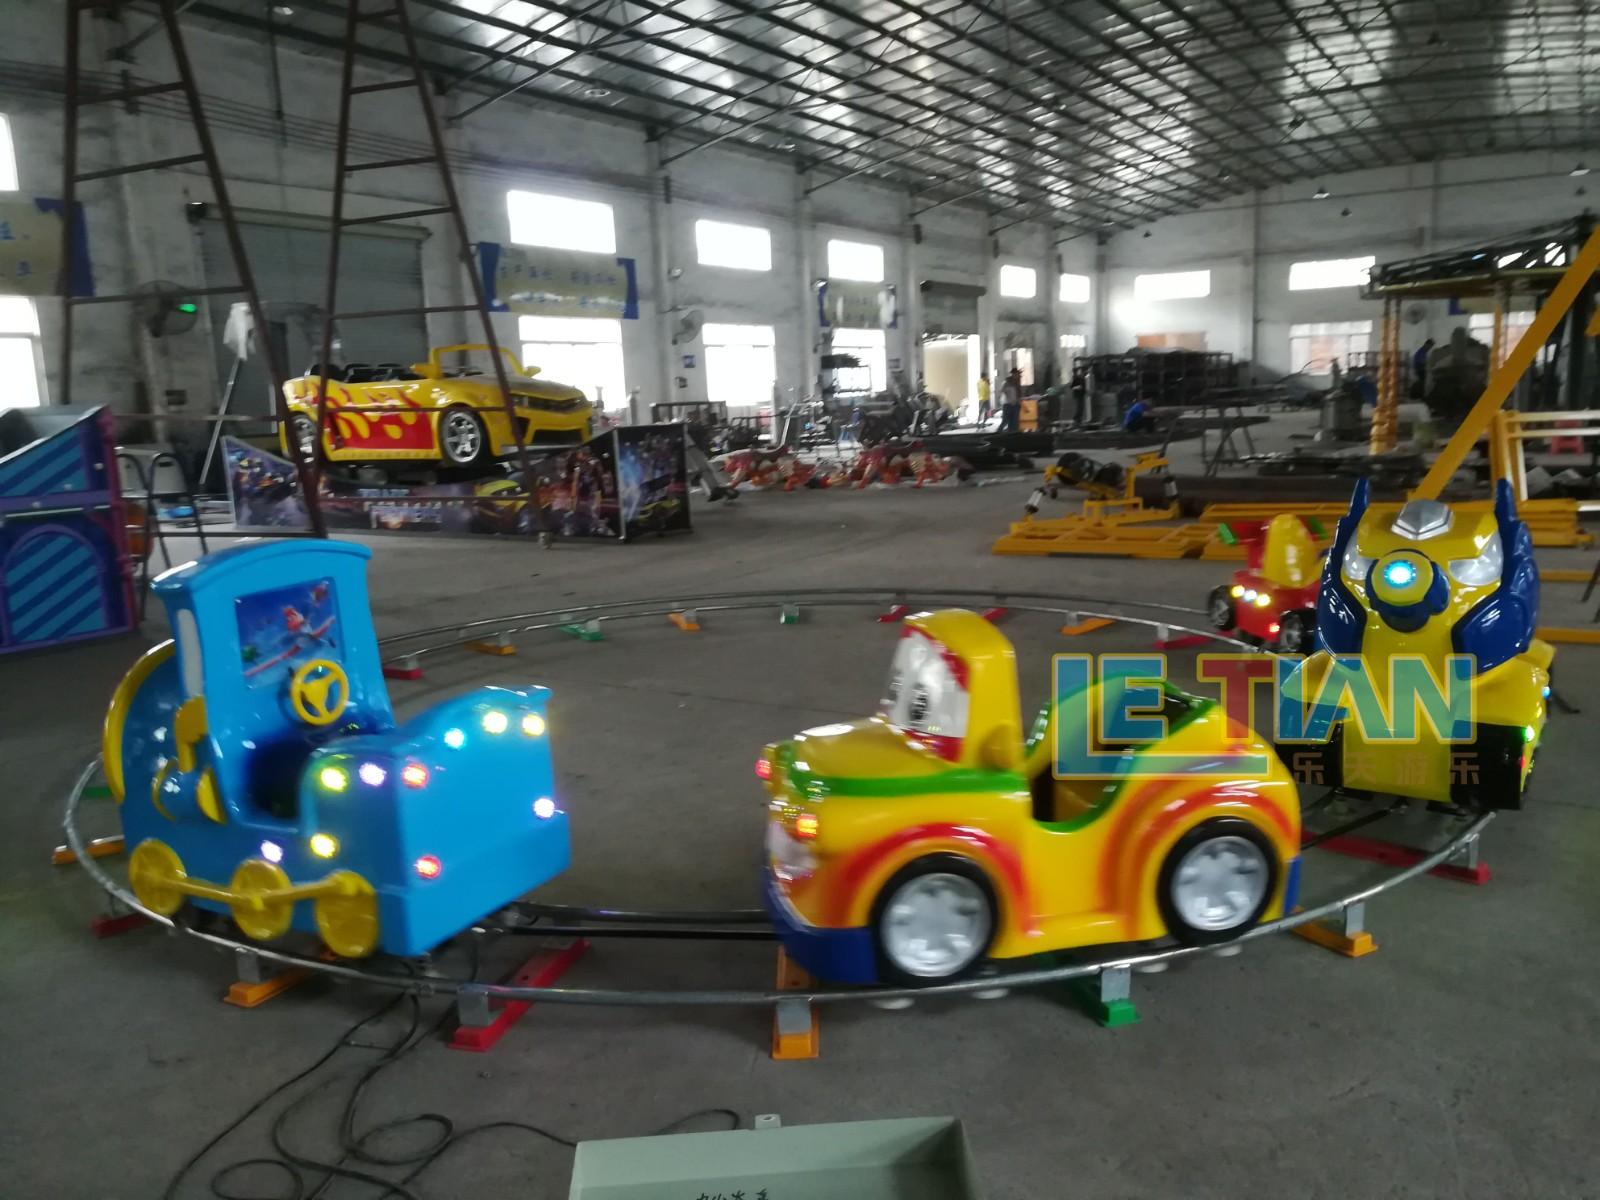 Custom theme park trains for sale lt7086c company children's palace-1